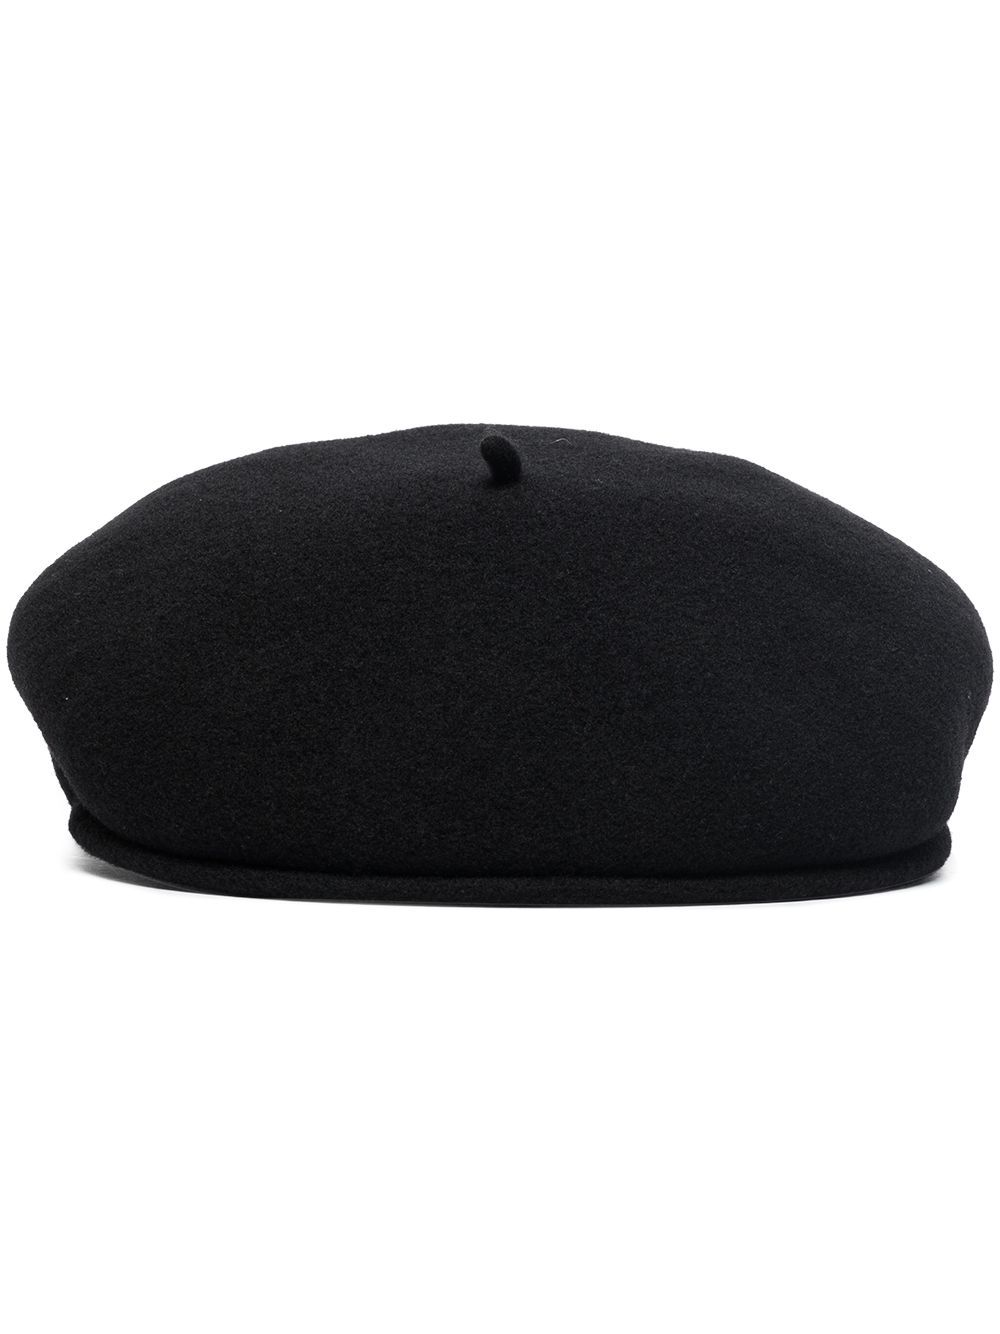 Cappello in lana con logo